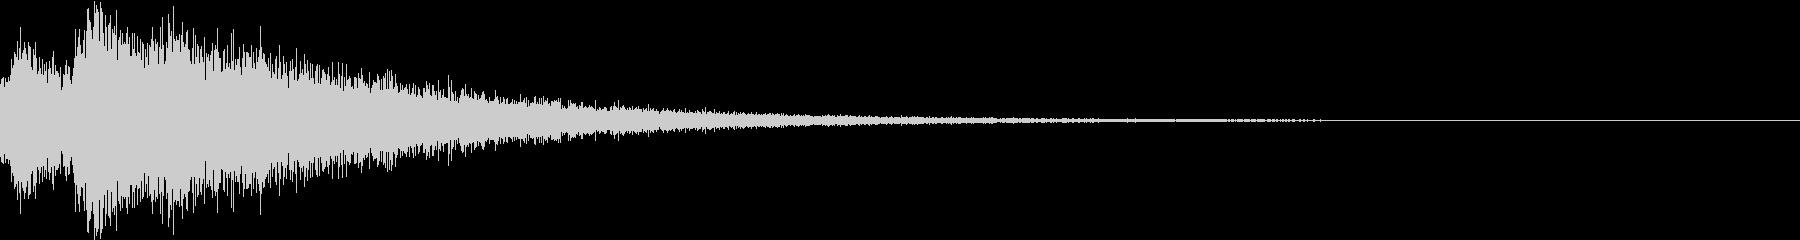 TV RADIO SFX7 結果発表前の未再生の波形